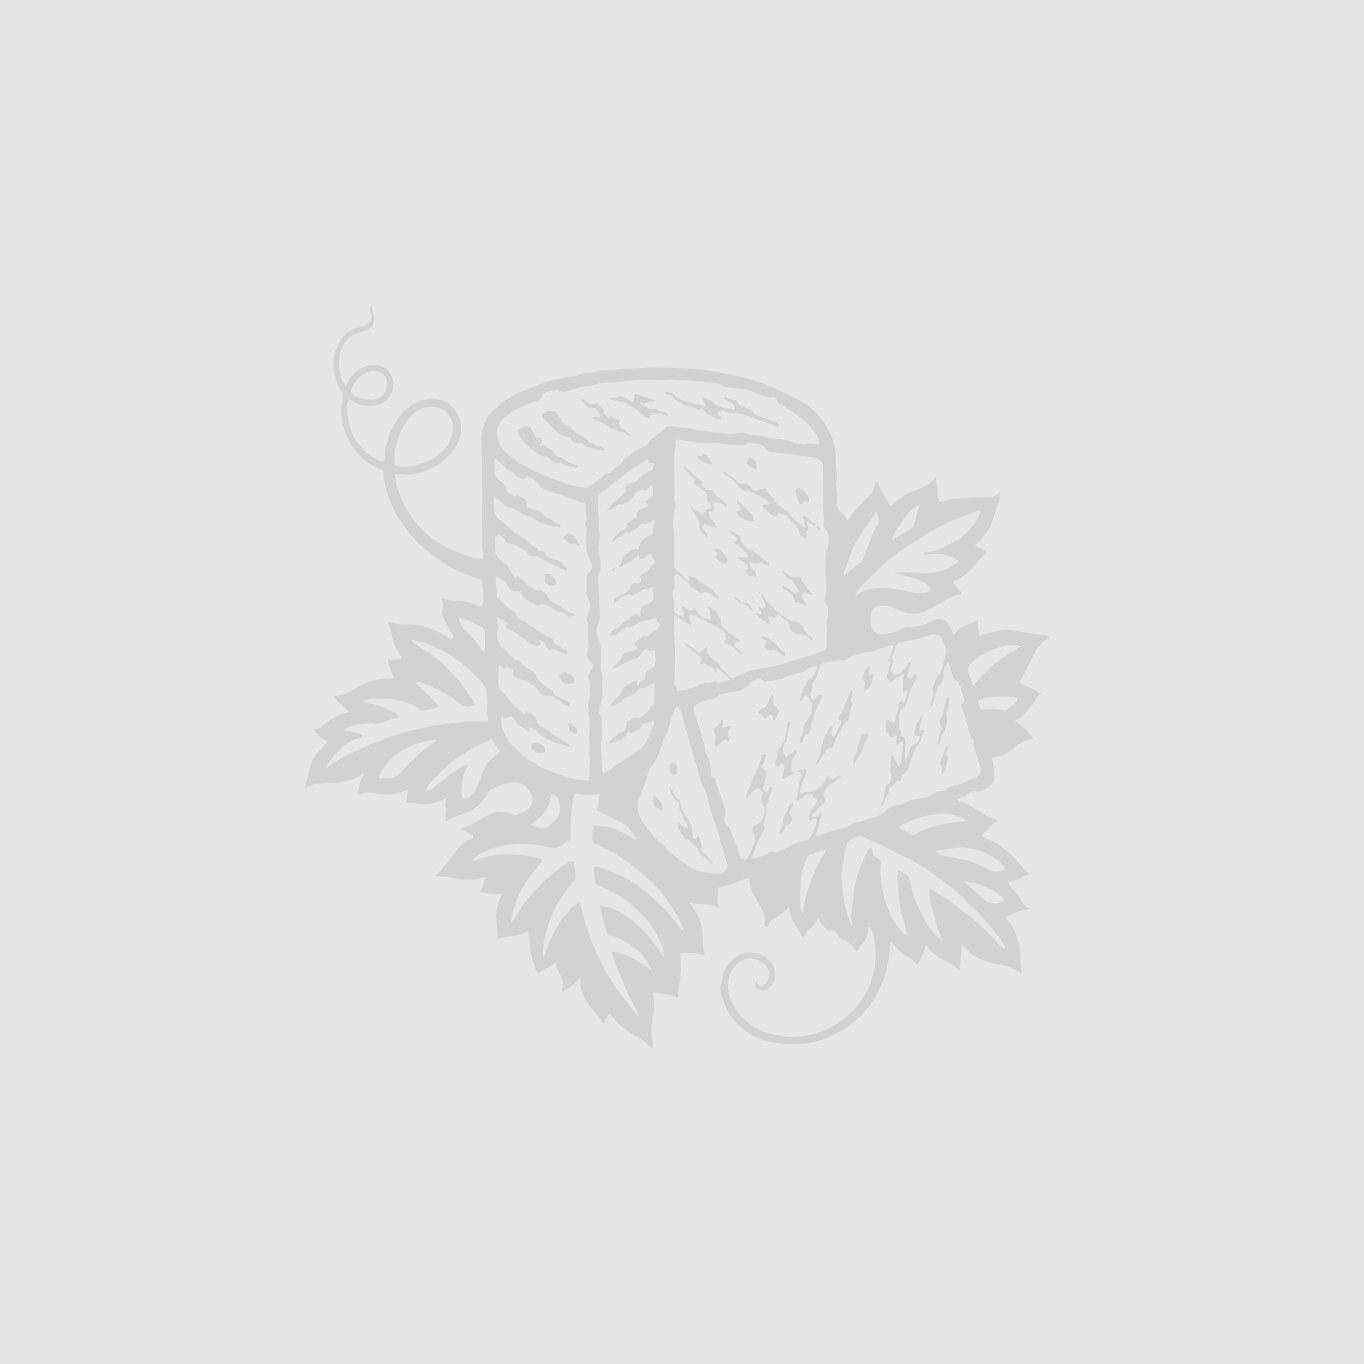 Mør Snap Crackers: Wholemeal Spelt and Sourdough